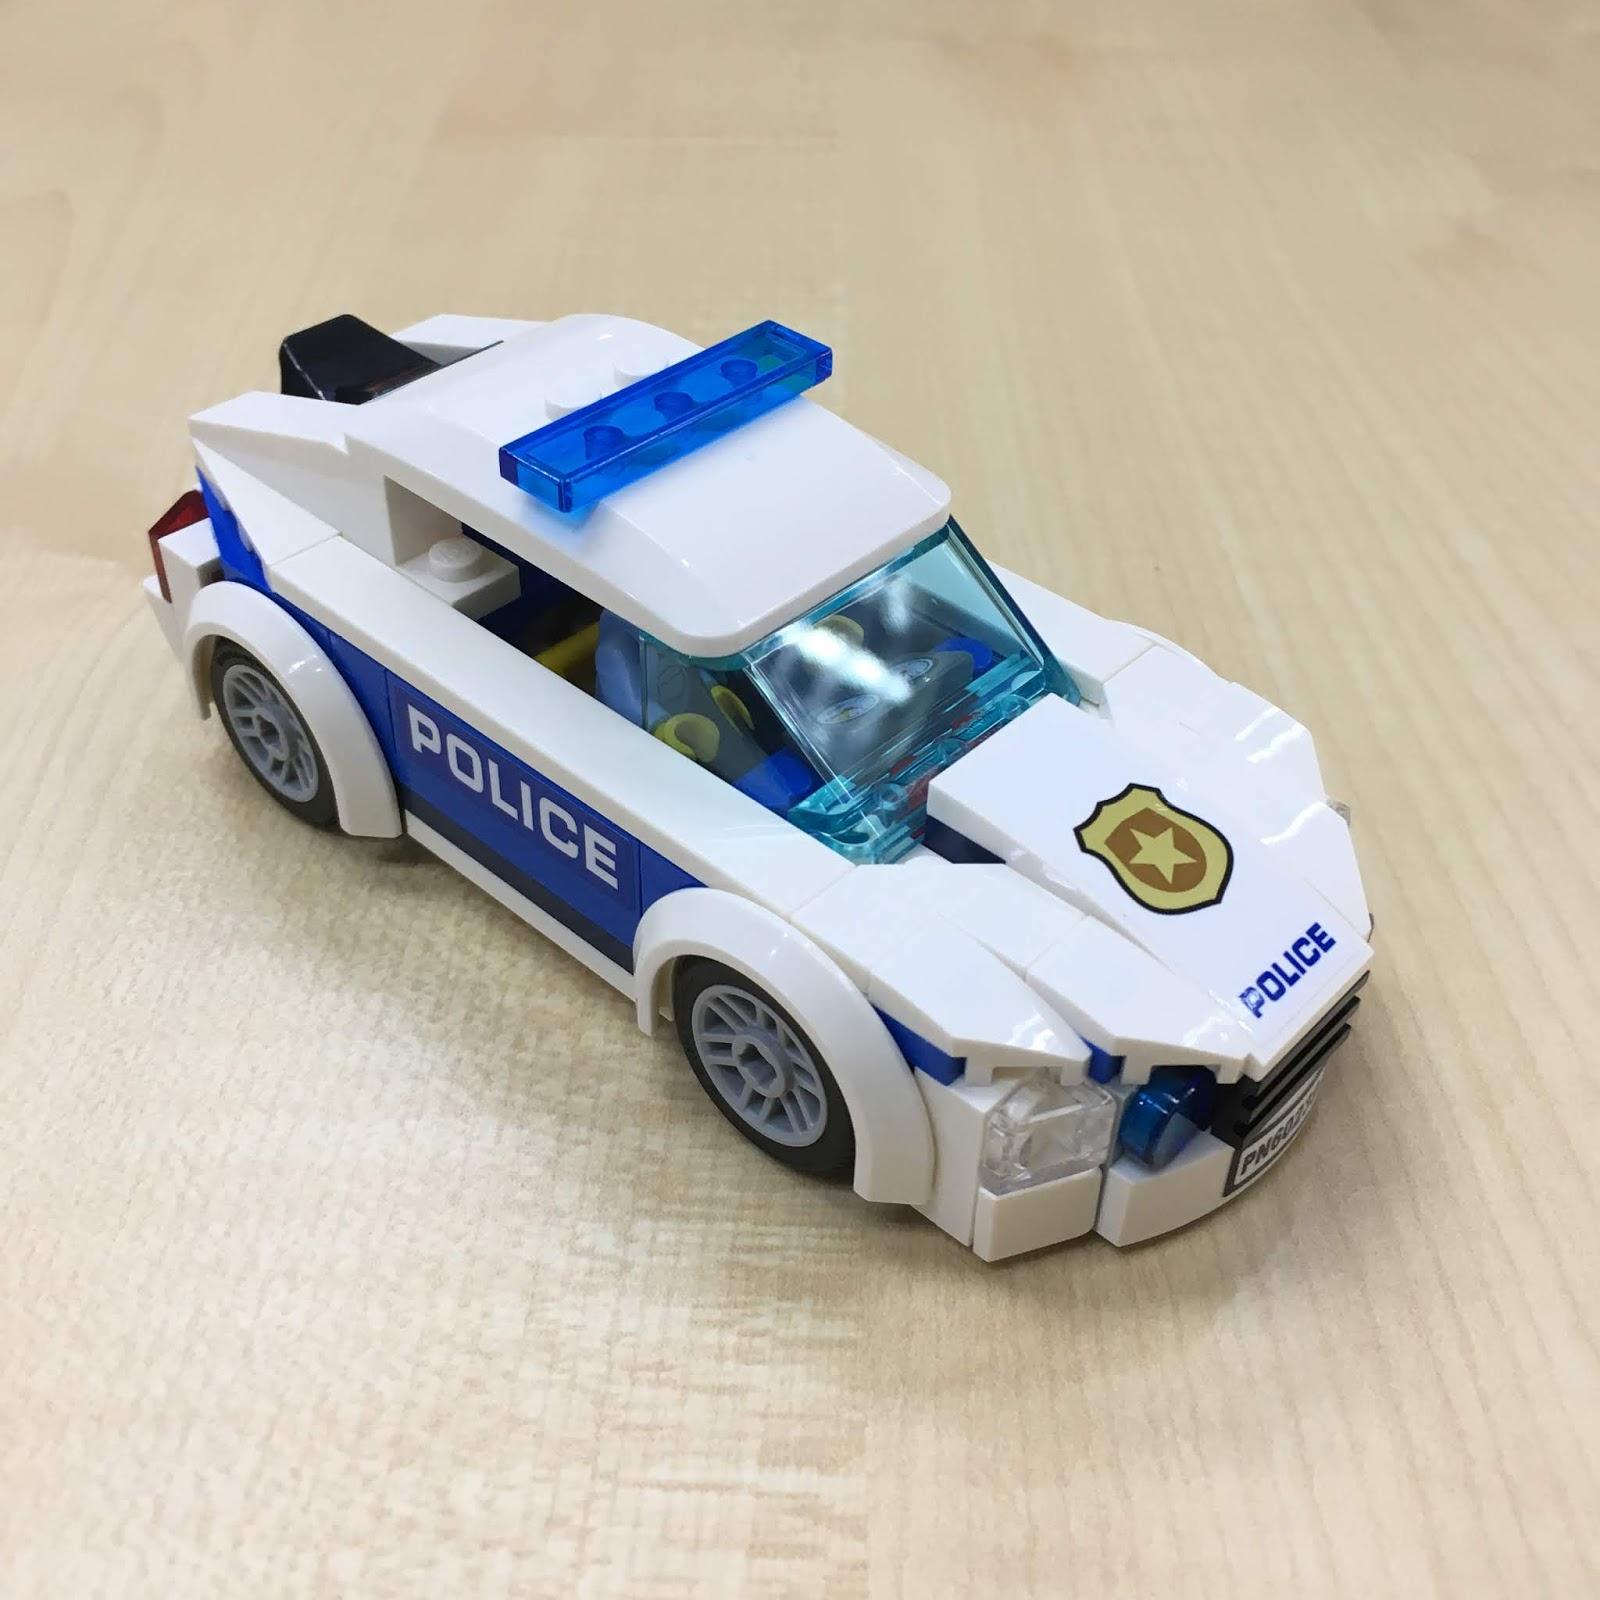 92 Piece New 2019 LEGO City Police Patrol Car 60239 Building Kit